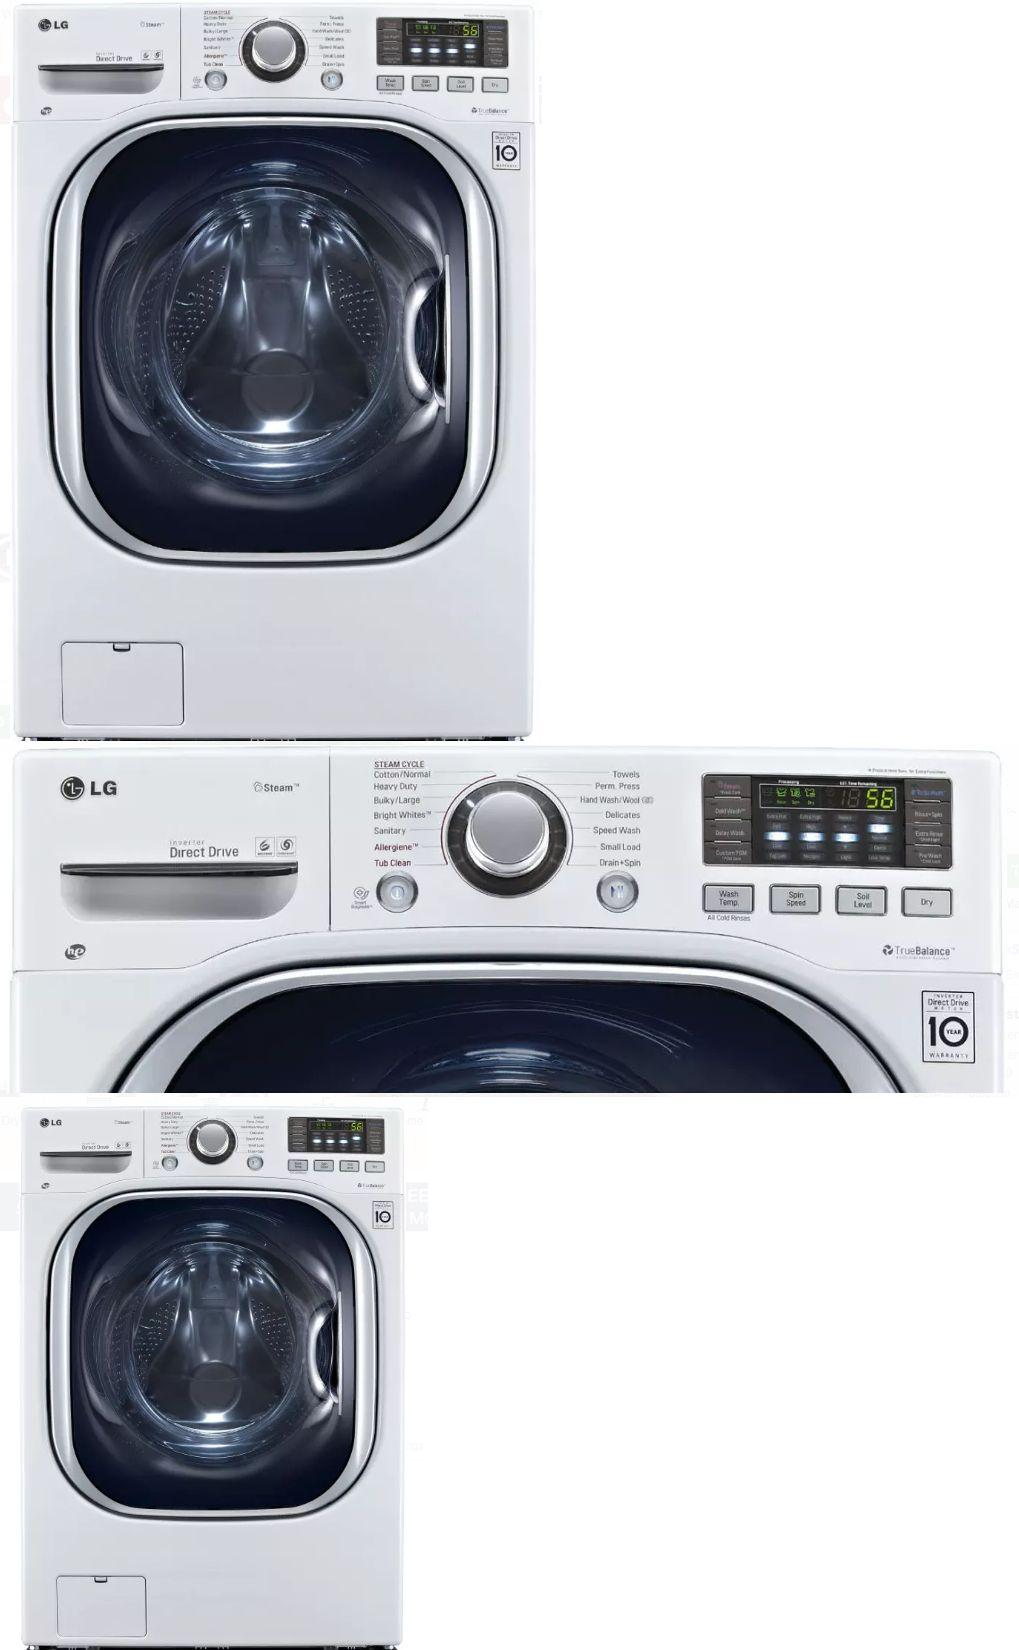 Washing Machines 71256 Lg Turbowash Series Wm3997hwa 27 Inch